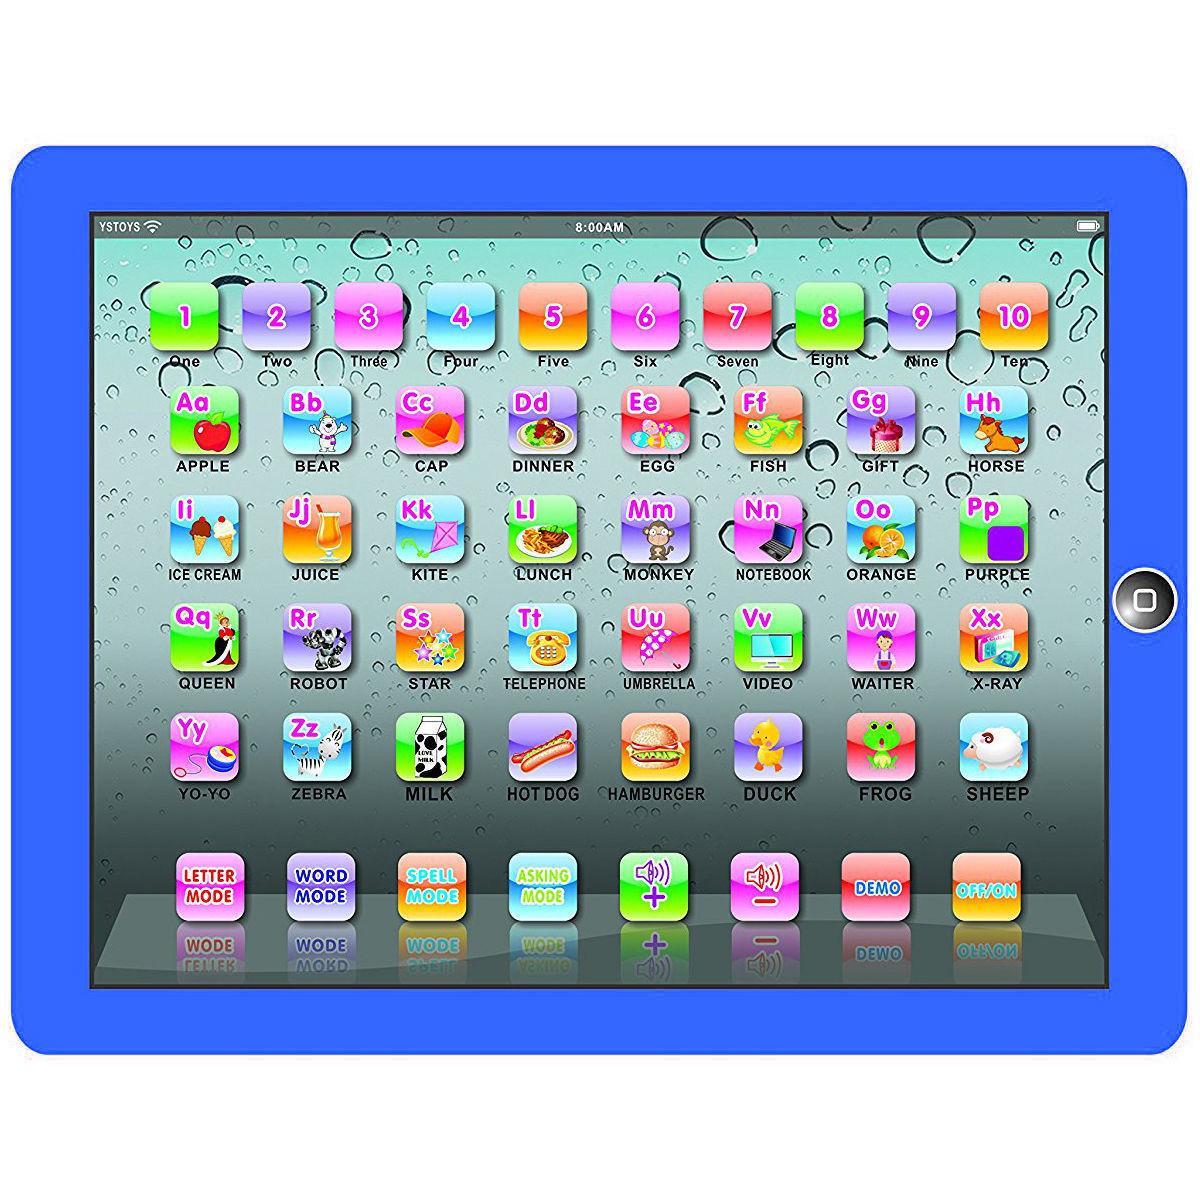 Keimav Ypad Multimedia Learning Computer Toy Tool (blue) By Mp-Keimav.